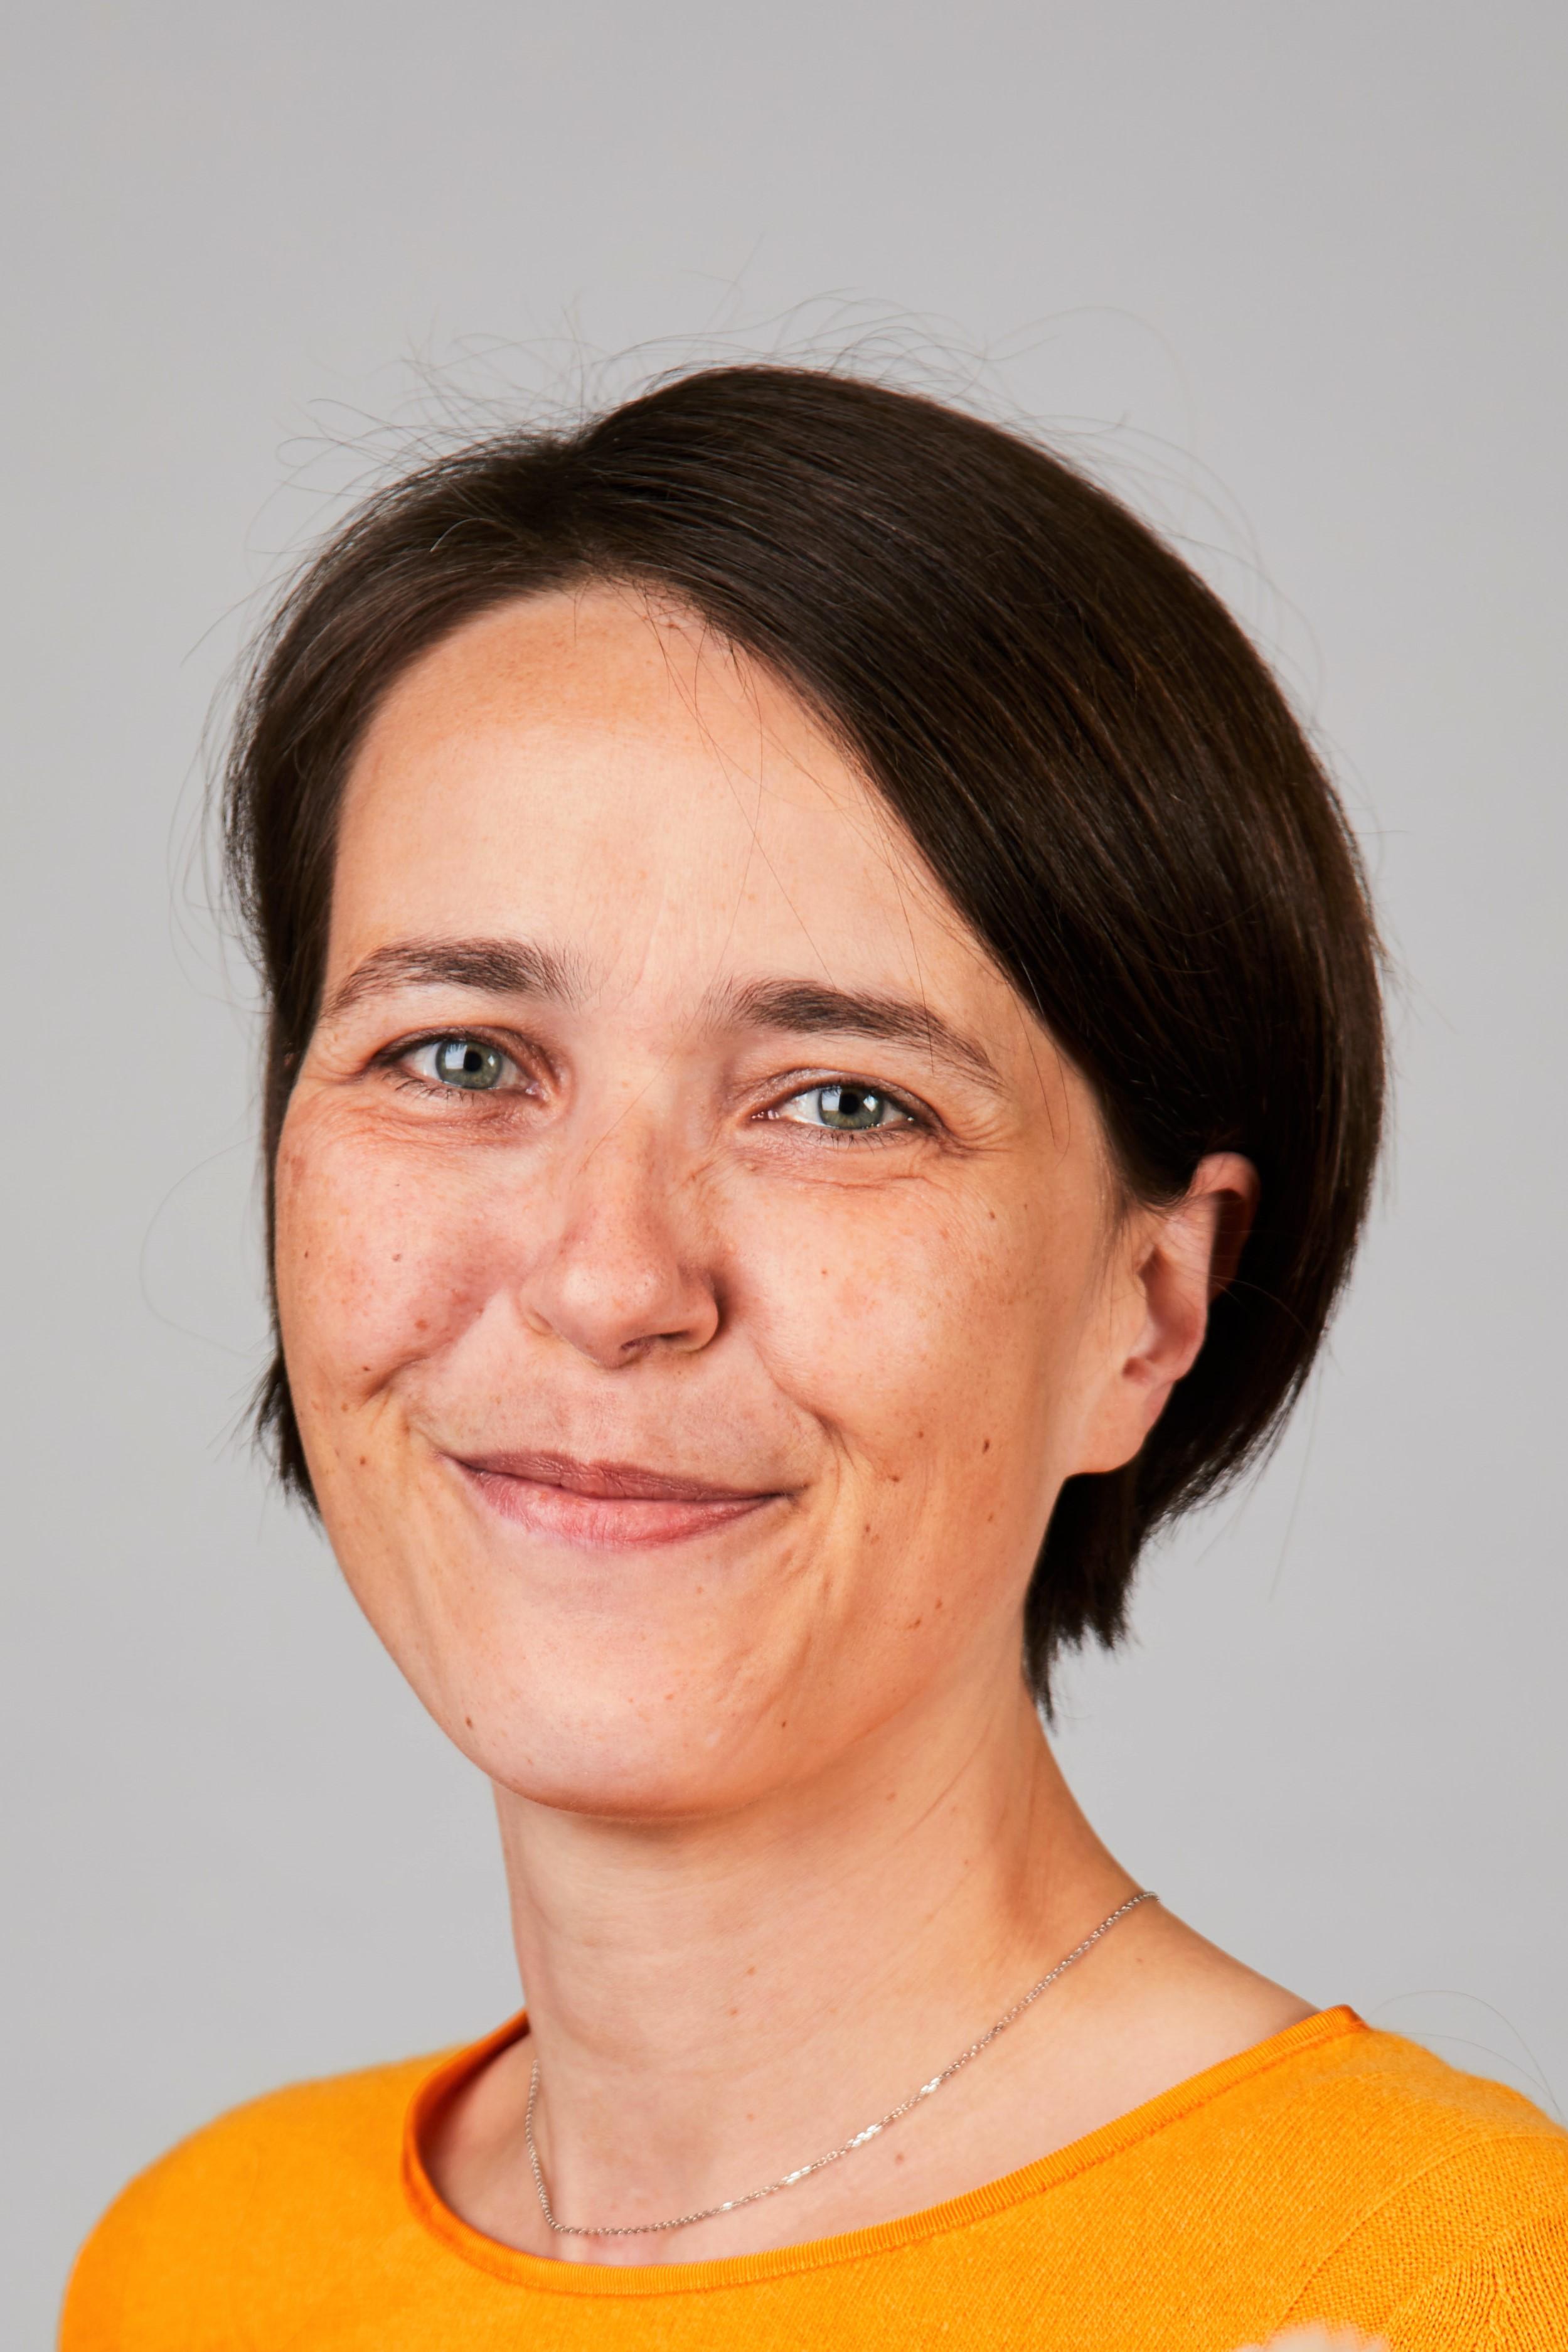 Cecile Vincke